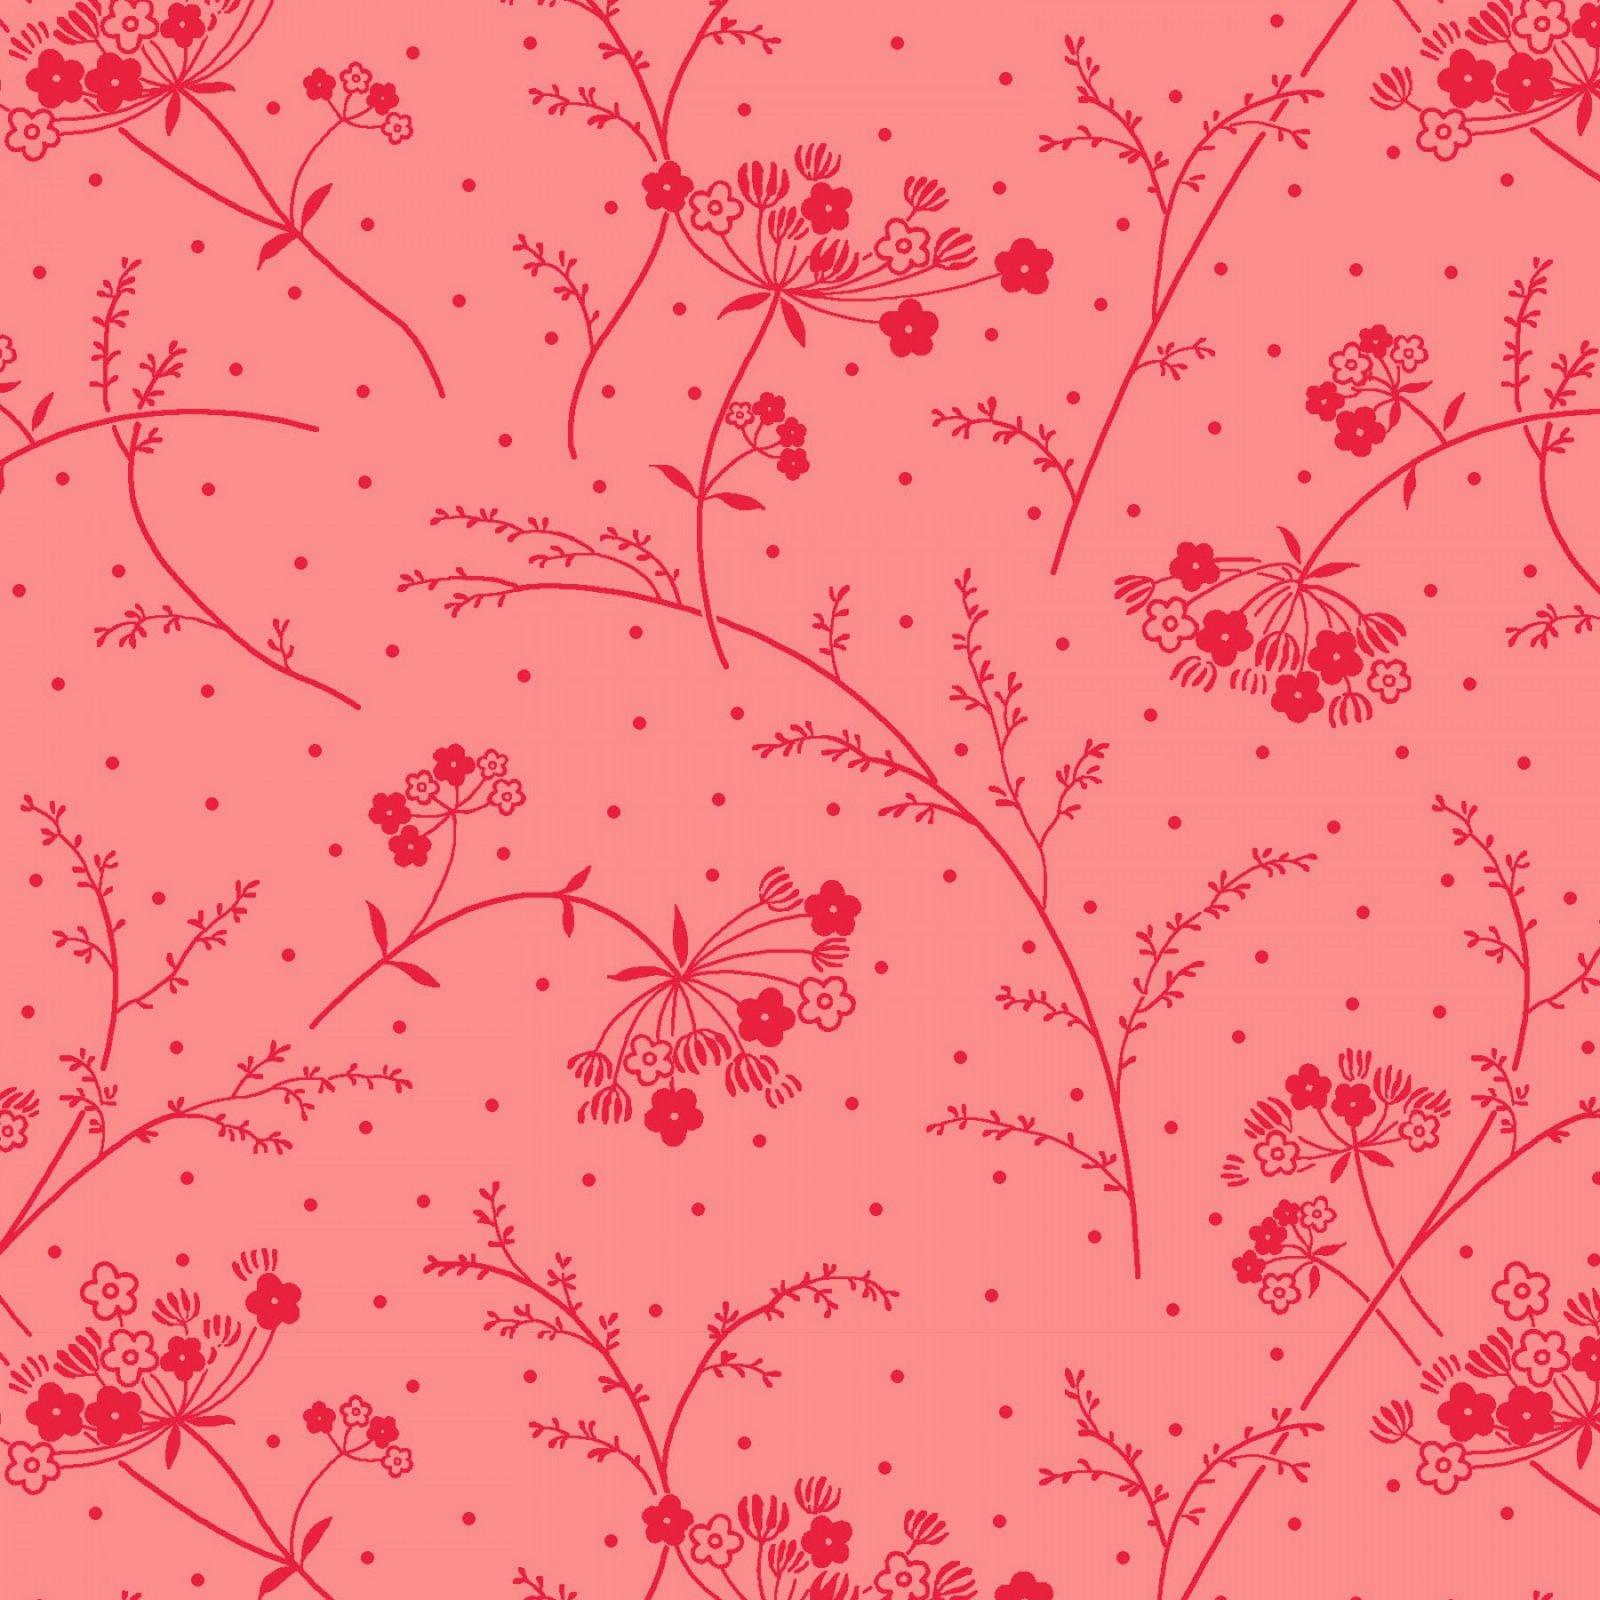 KimberBell Basics Make a Wish Pink